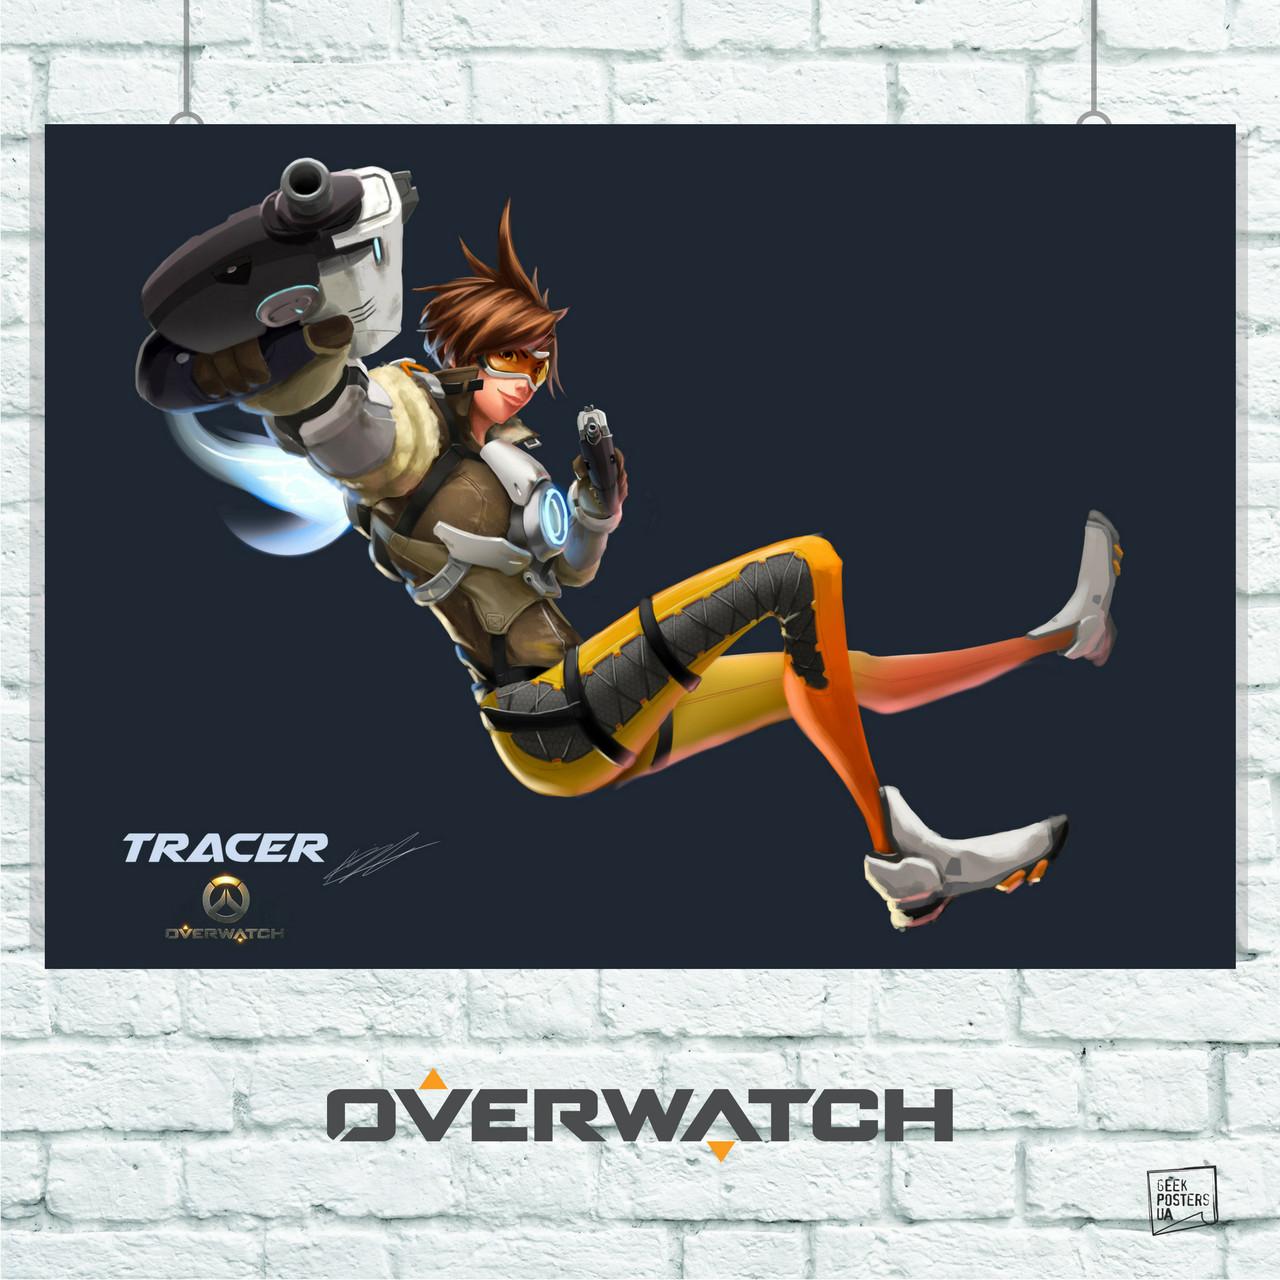 Постер Overwatch, Трейсер (рисунок). Размер 60x42см (A2). Глянцевая бумага